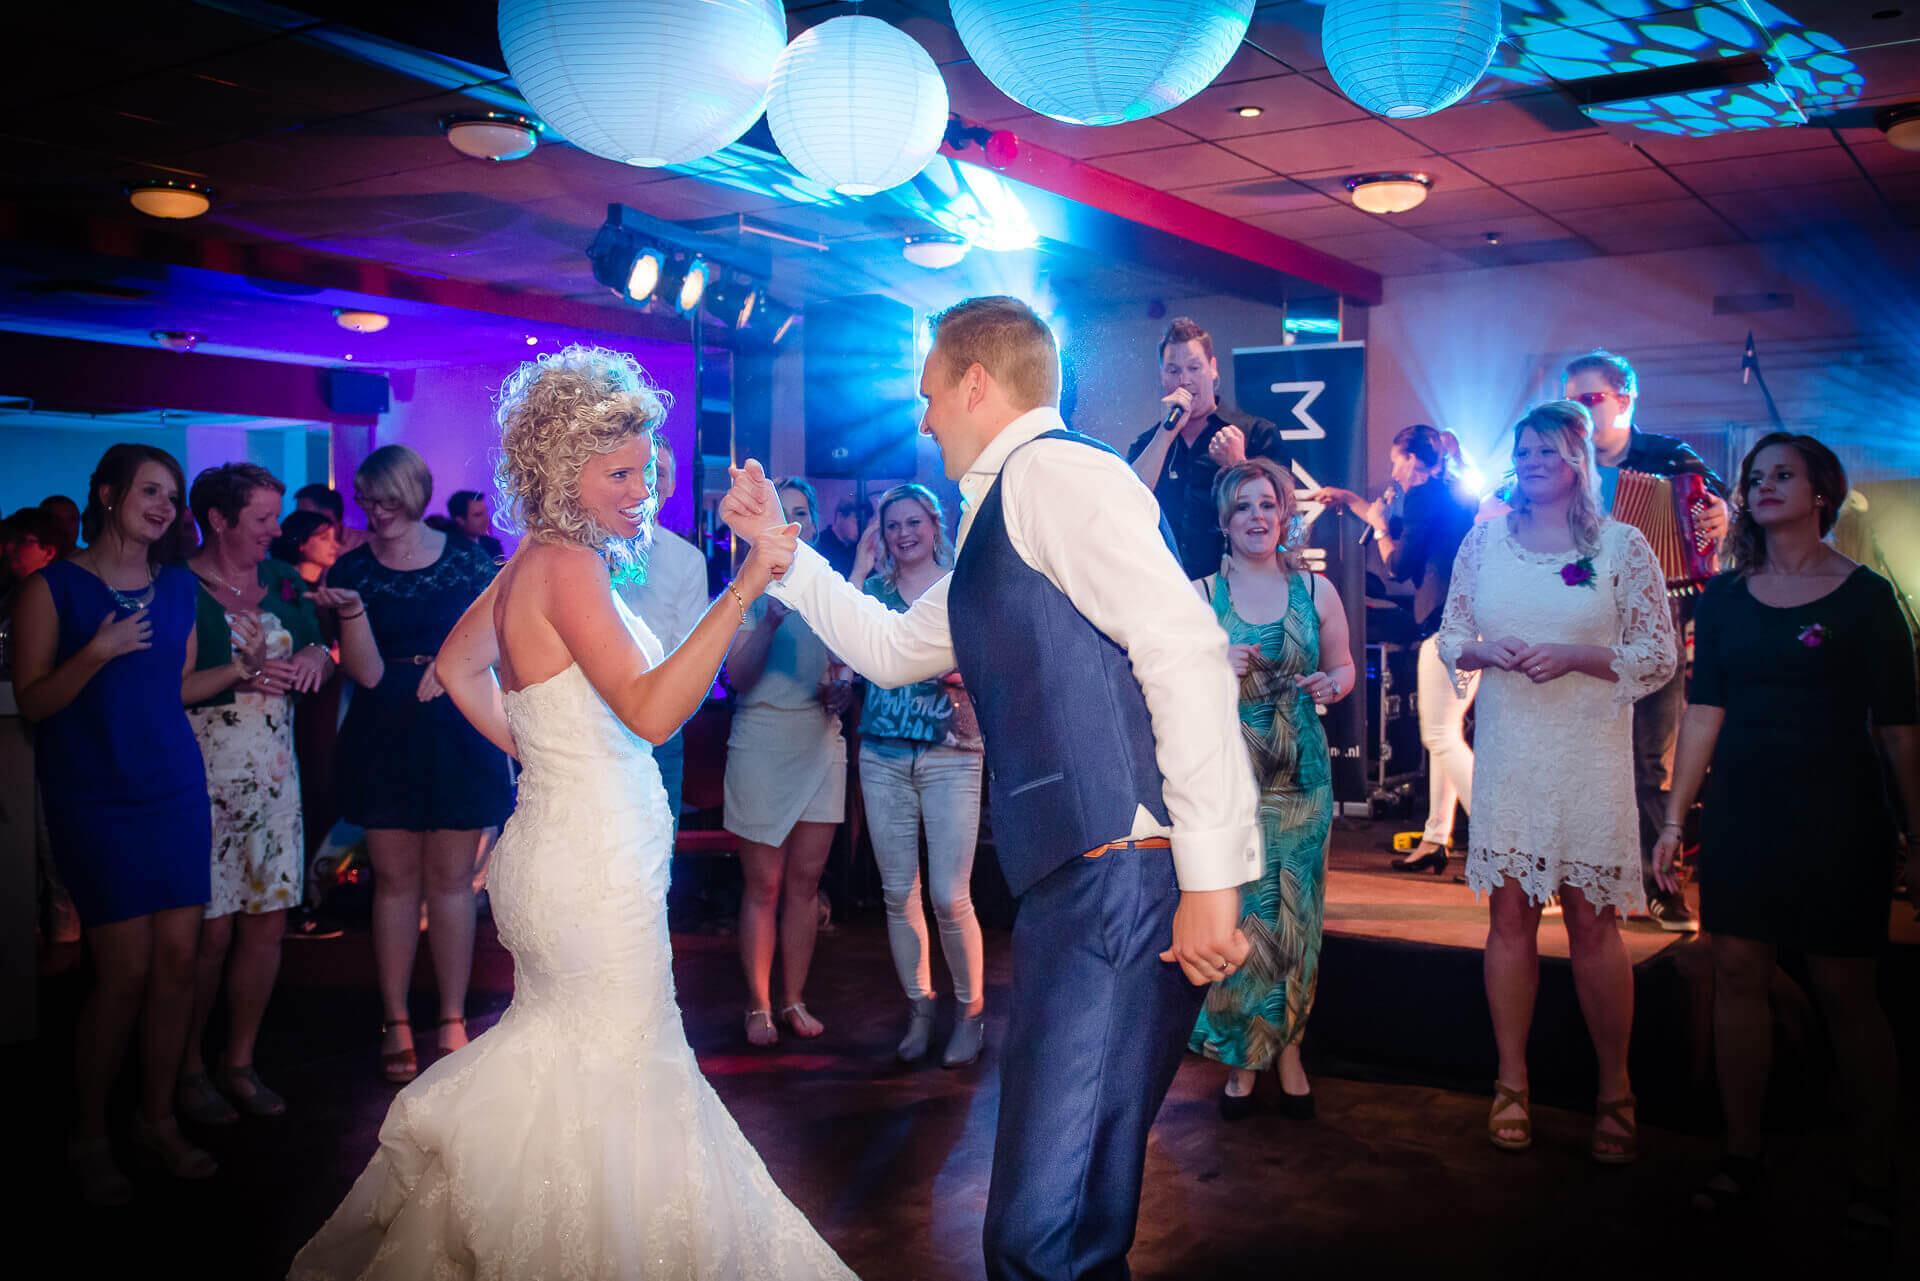 Bruidsfotografie Berghem Feestavond door Bruidsfotograaf Sandy Peters